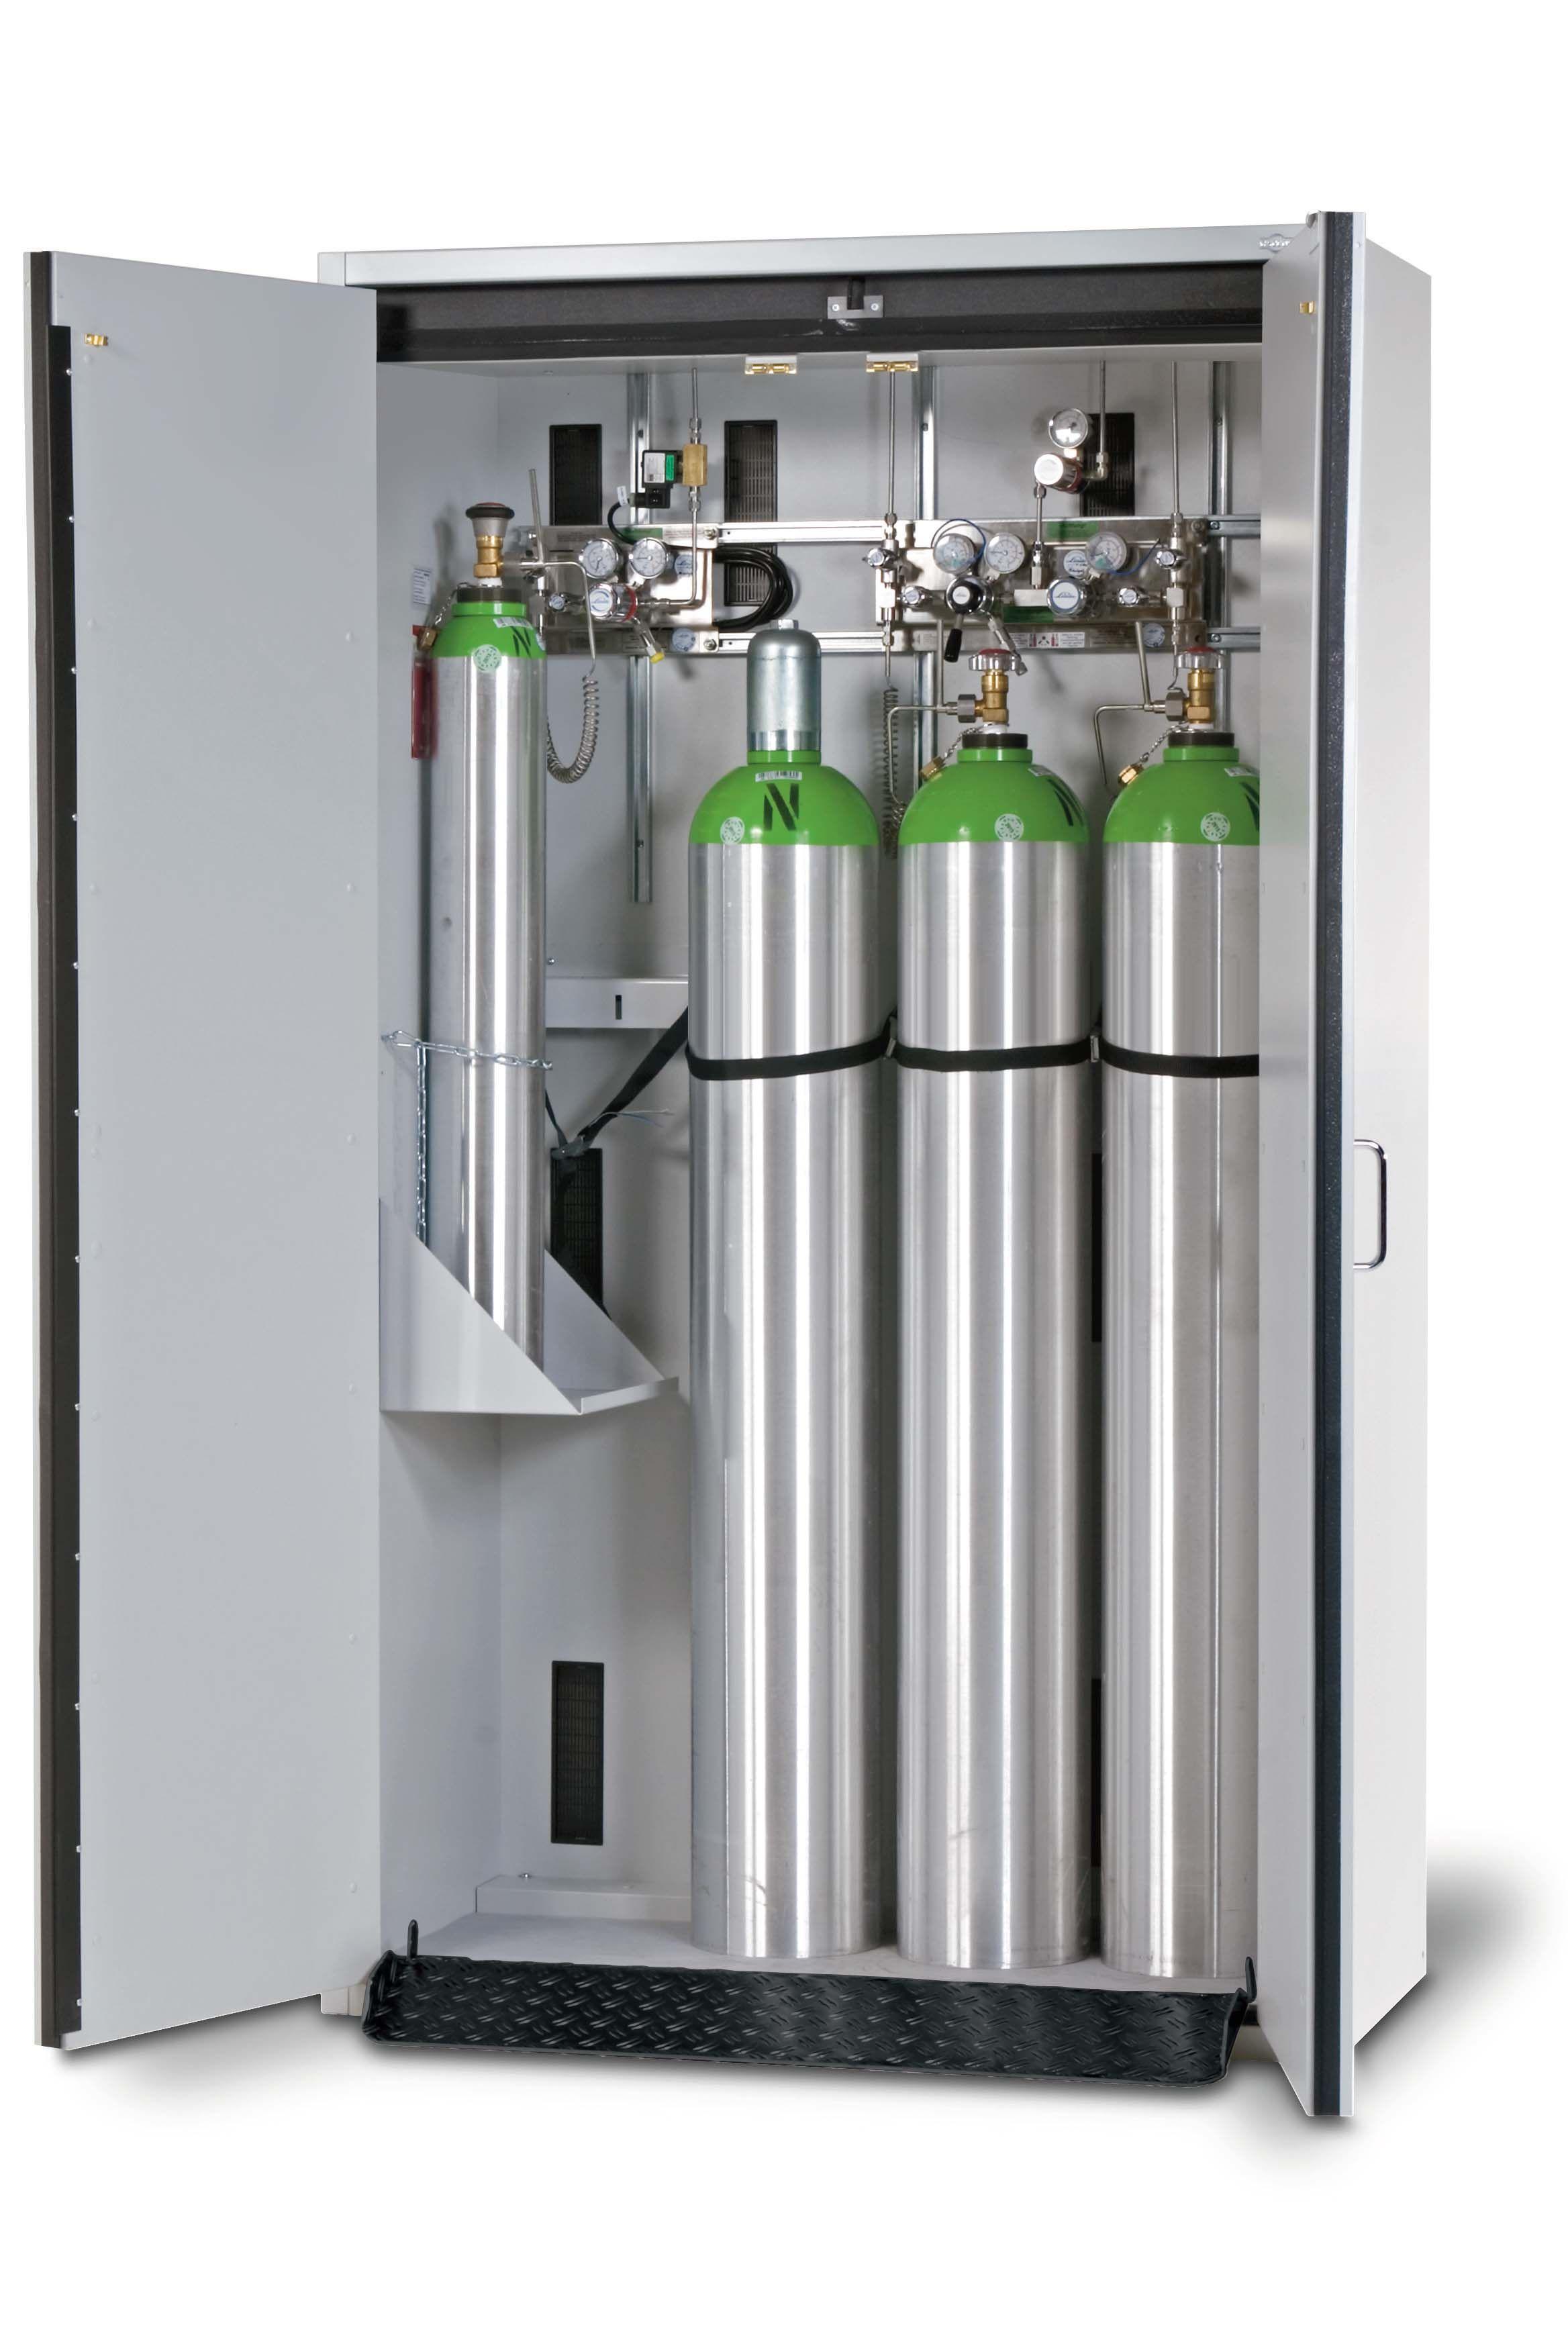 Gas Cylinder Cabinets EN 14470 2 Image Pictures